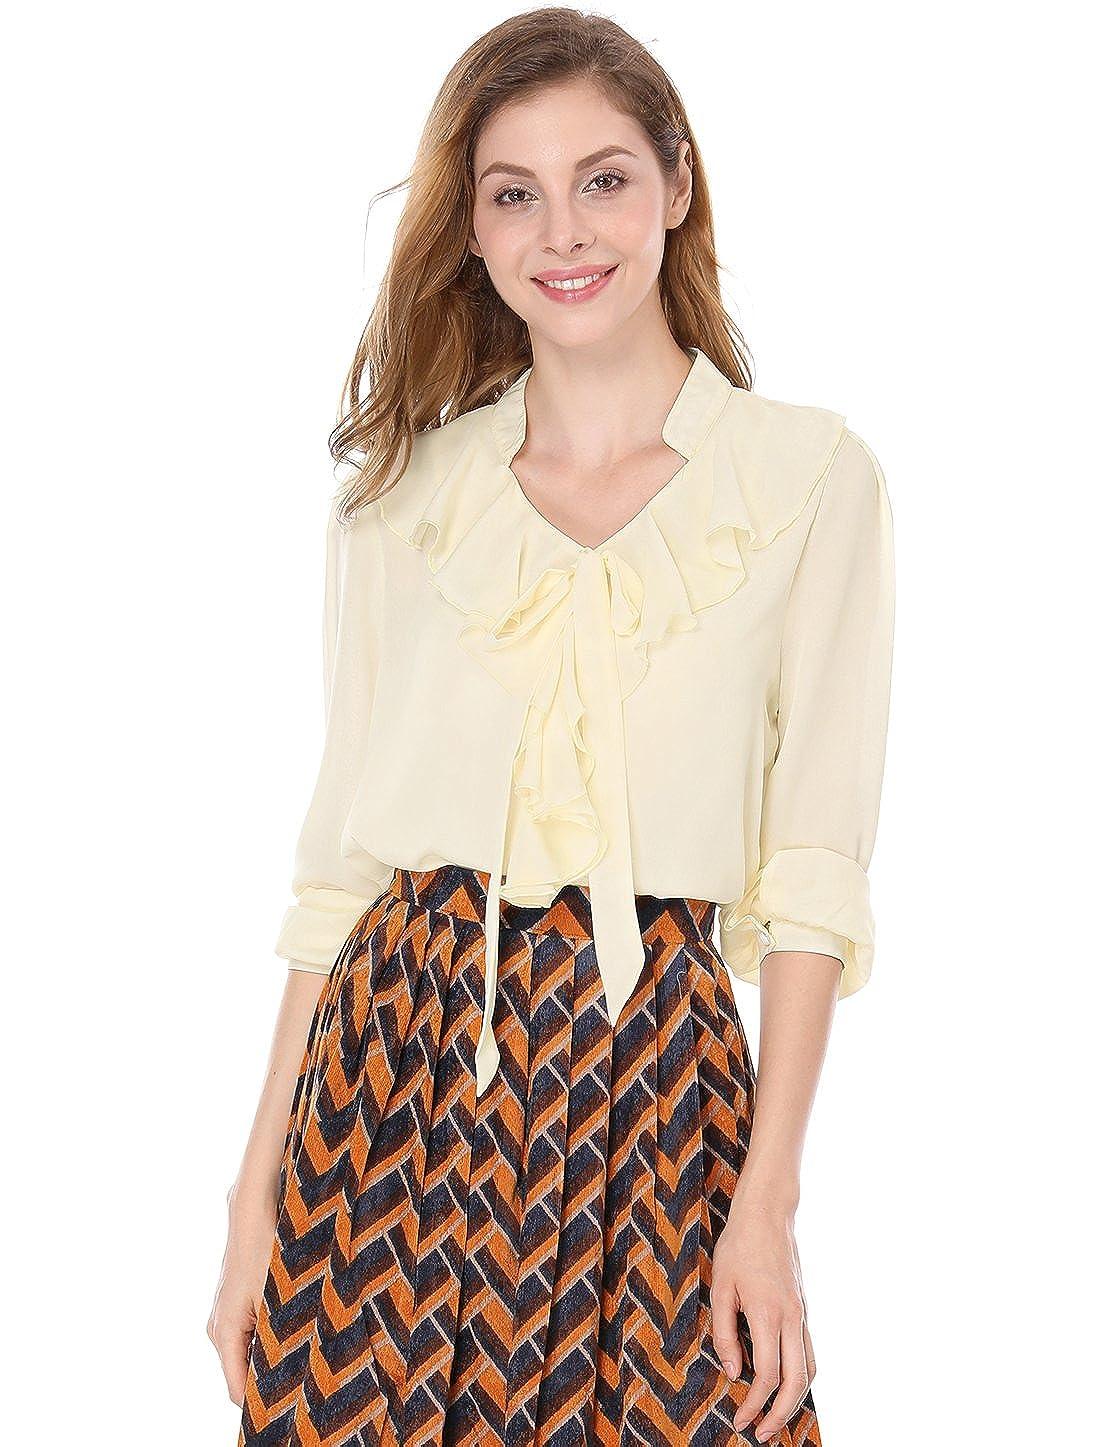 Allegra K Women Ruffle Collar Blouse Bow Long Sleeve Chiffon Tops a12070600ux0567